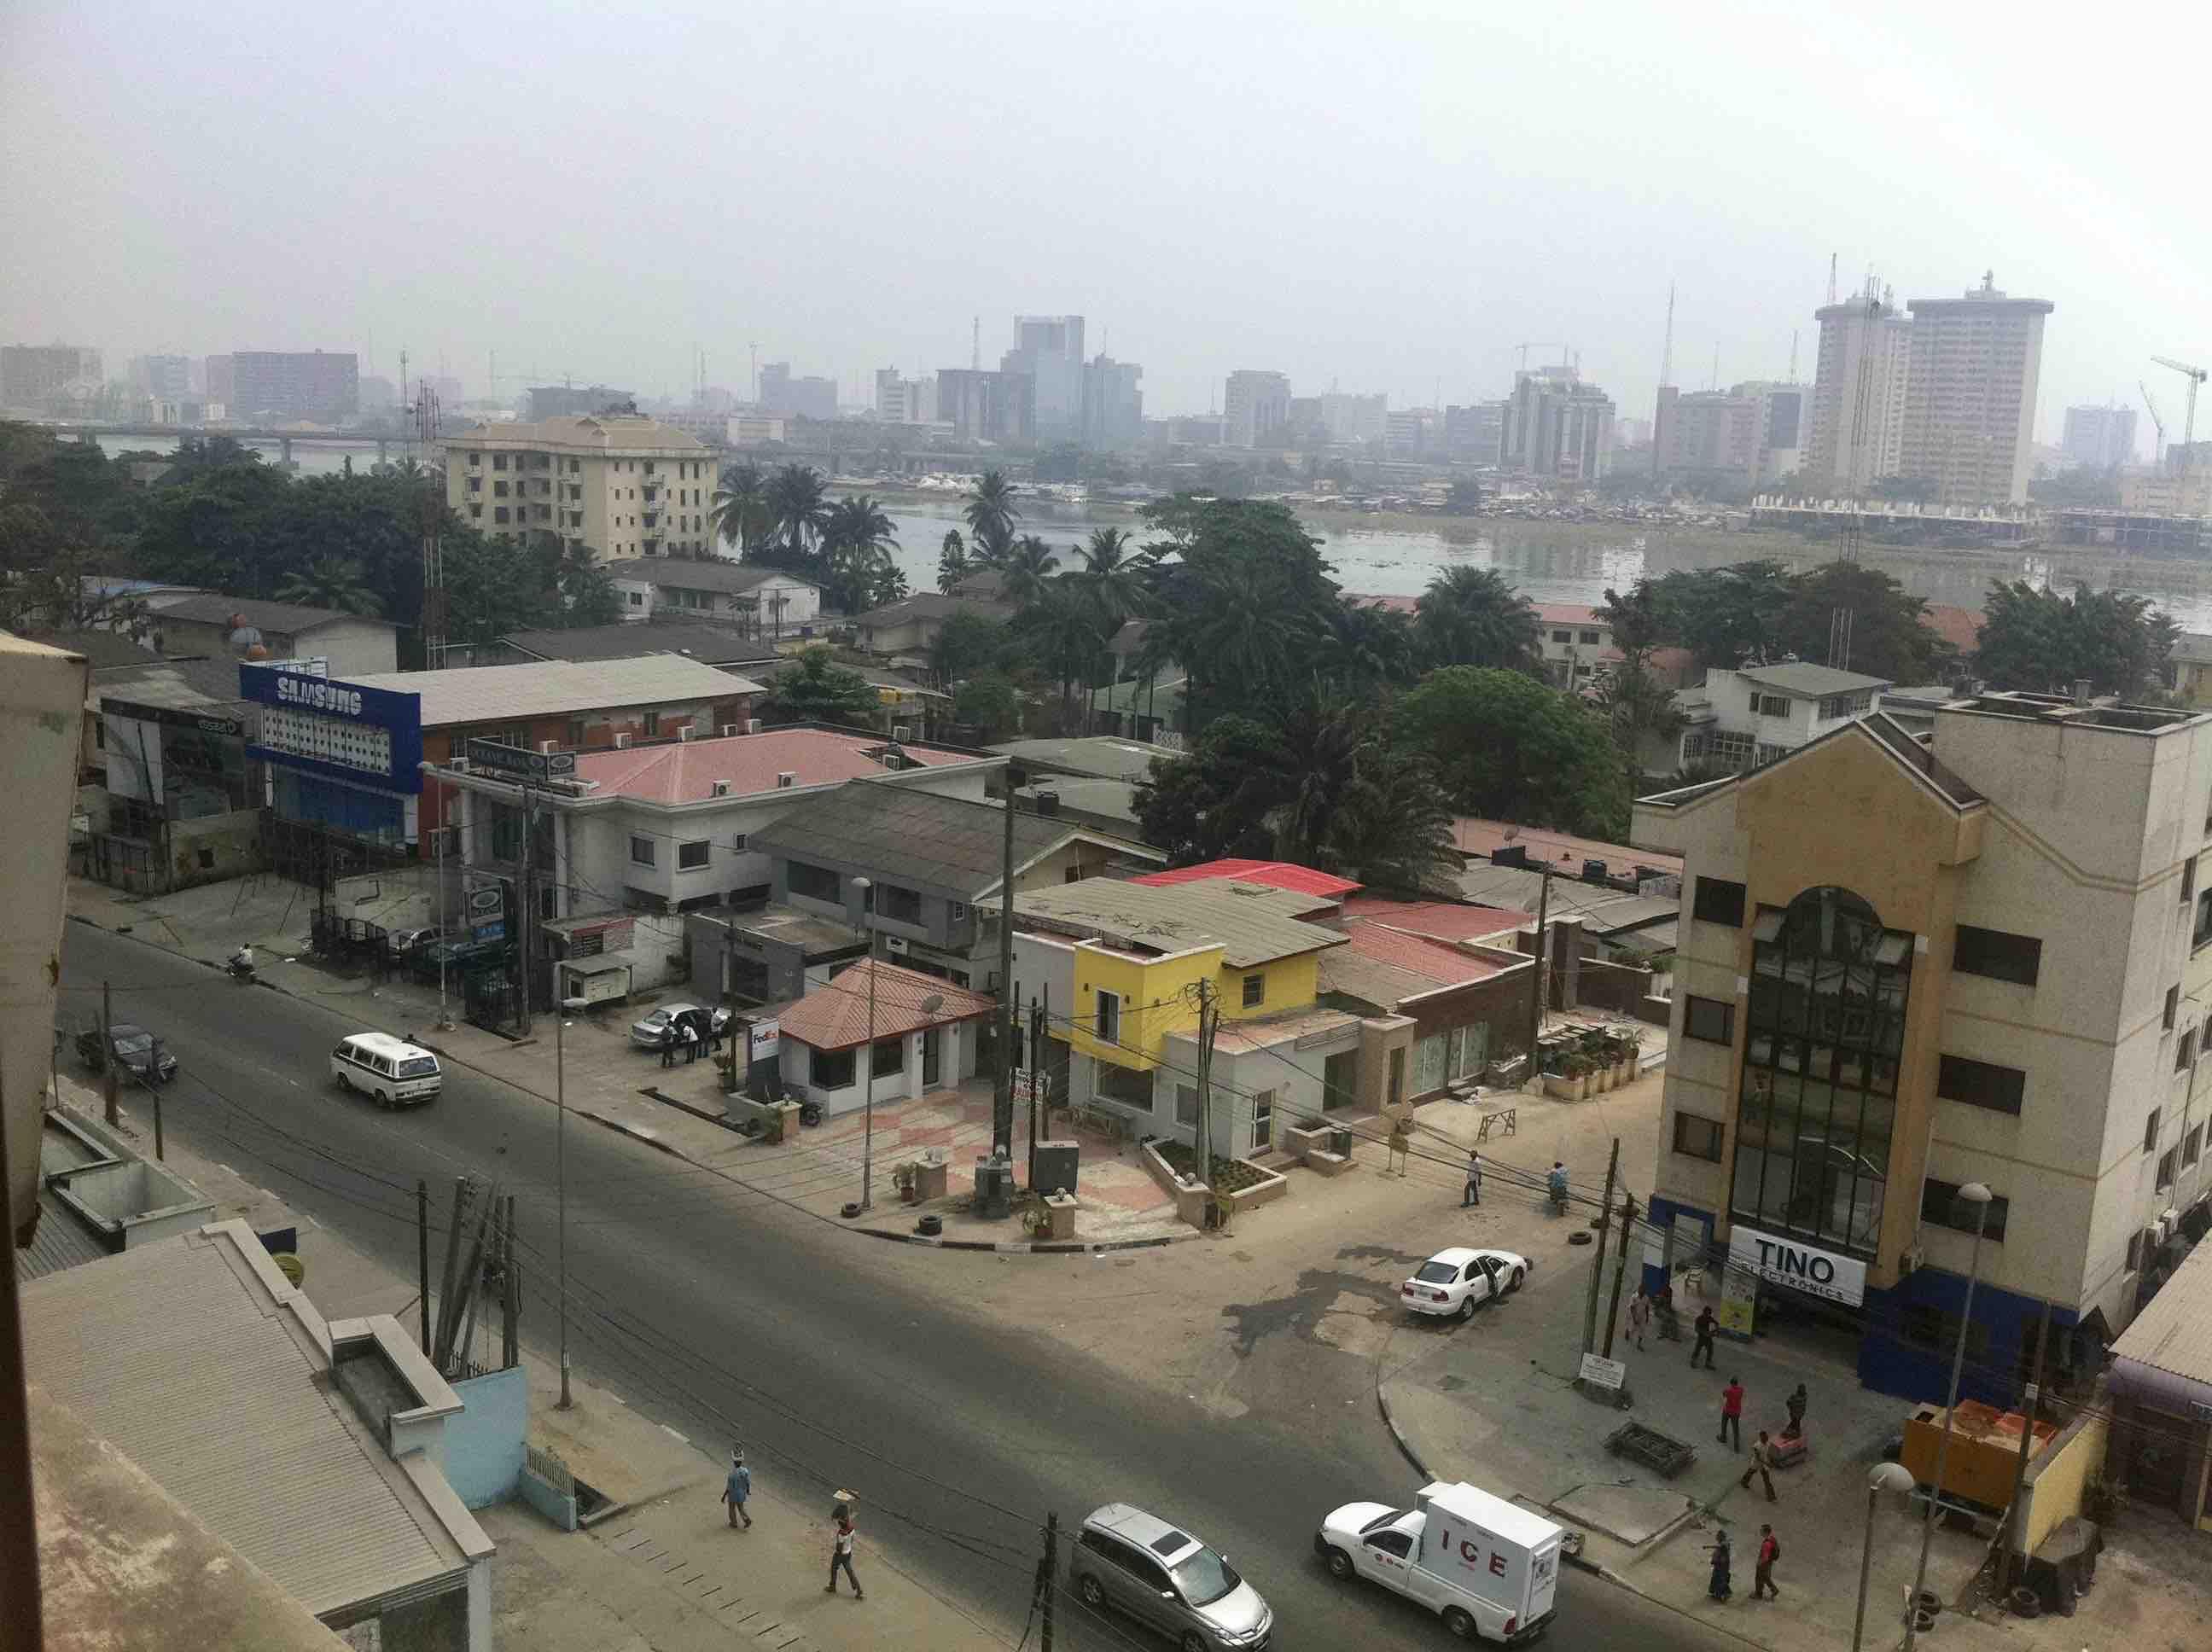 Awolowo Road, Ikoyi, Lagos State, Nigeria. #JujuFilms